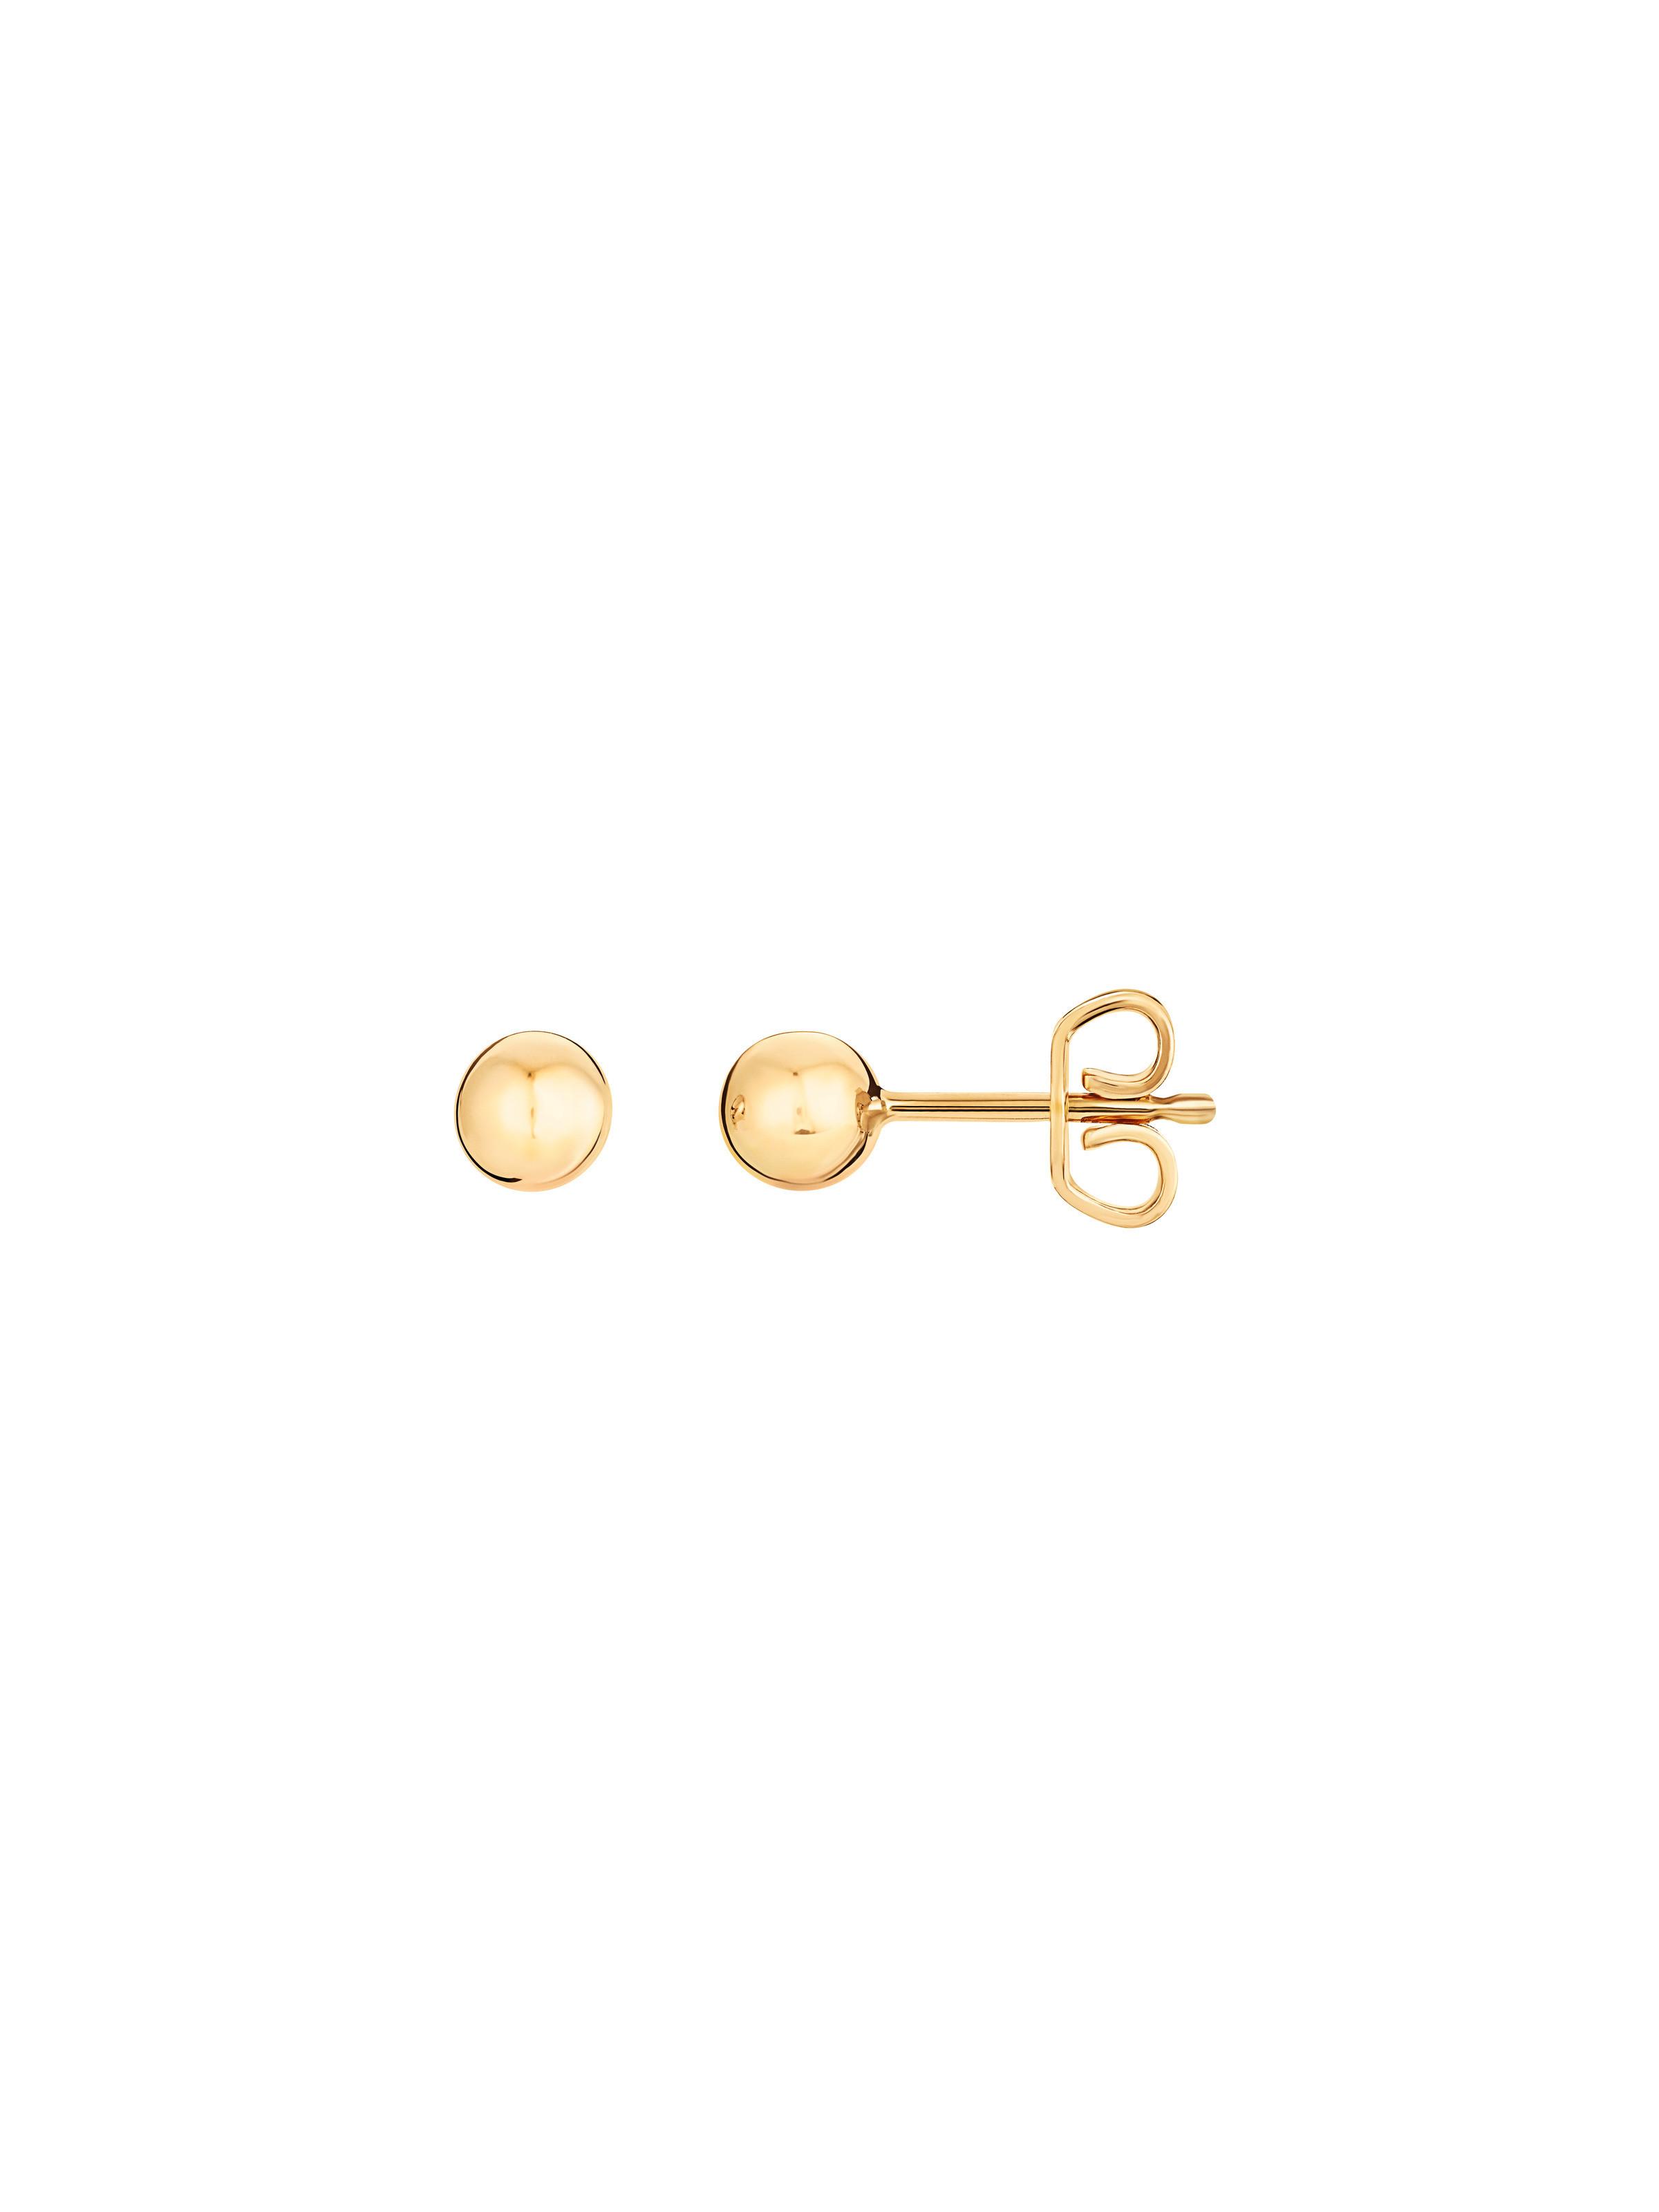 Minimalism earrings